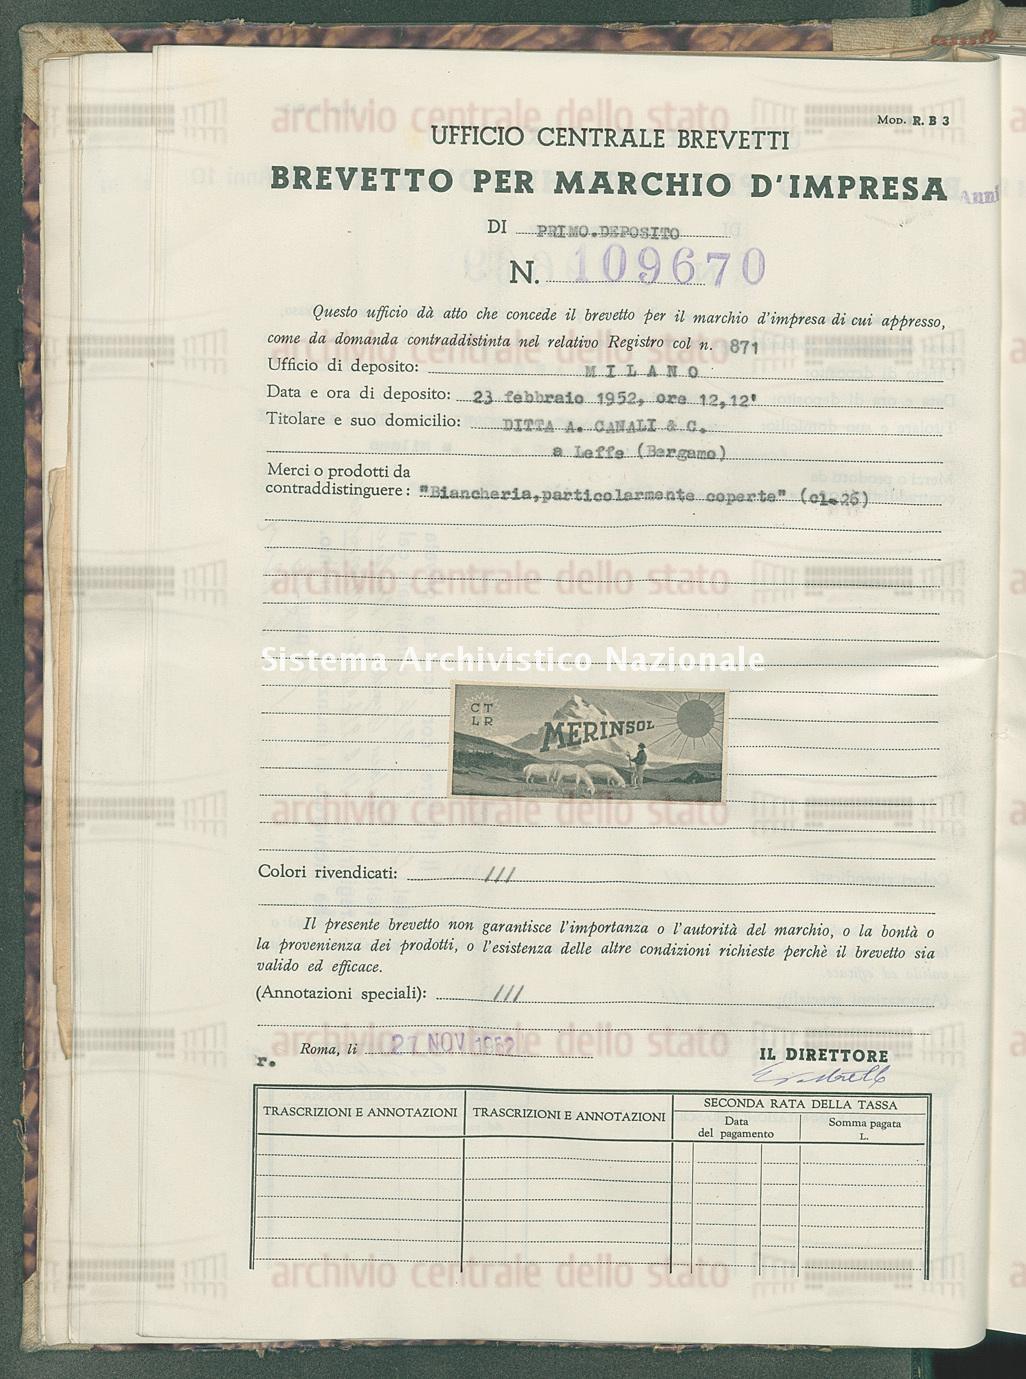 'Biancheria, particolarmente coperte' Ditta A. Canali & C. (27/11/1952)